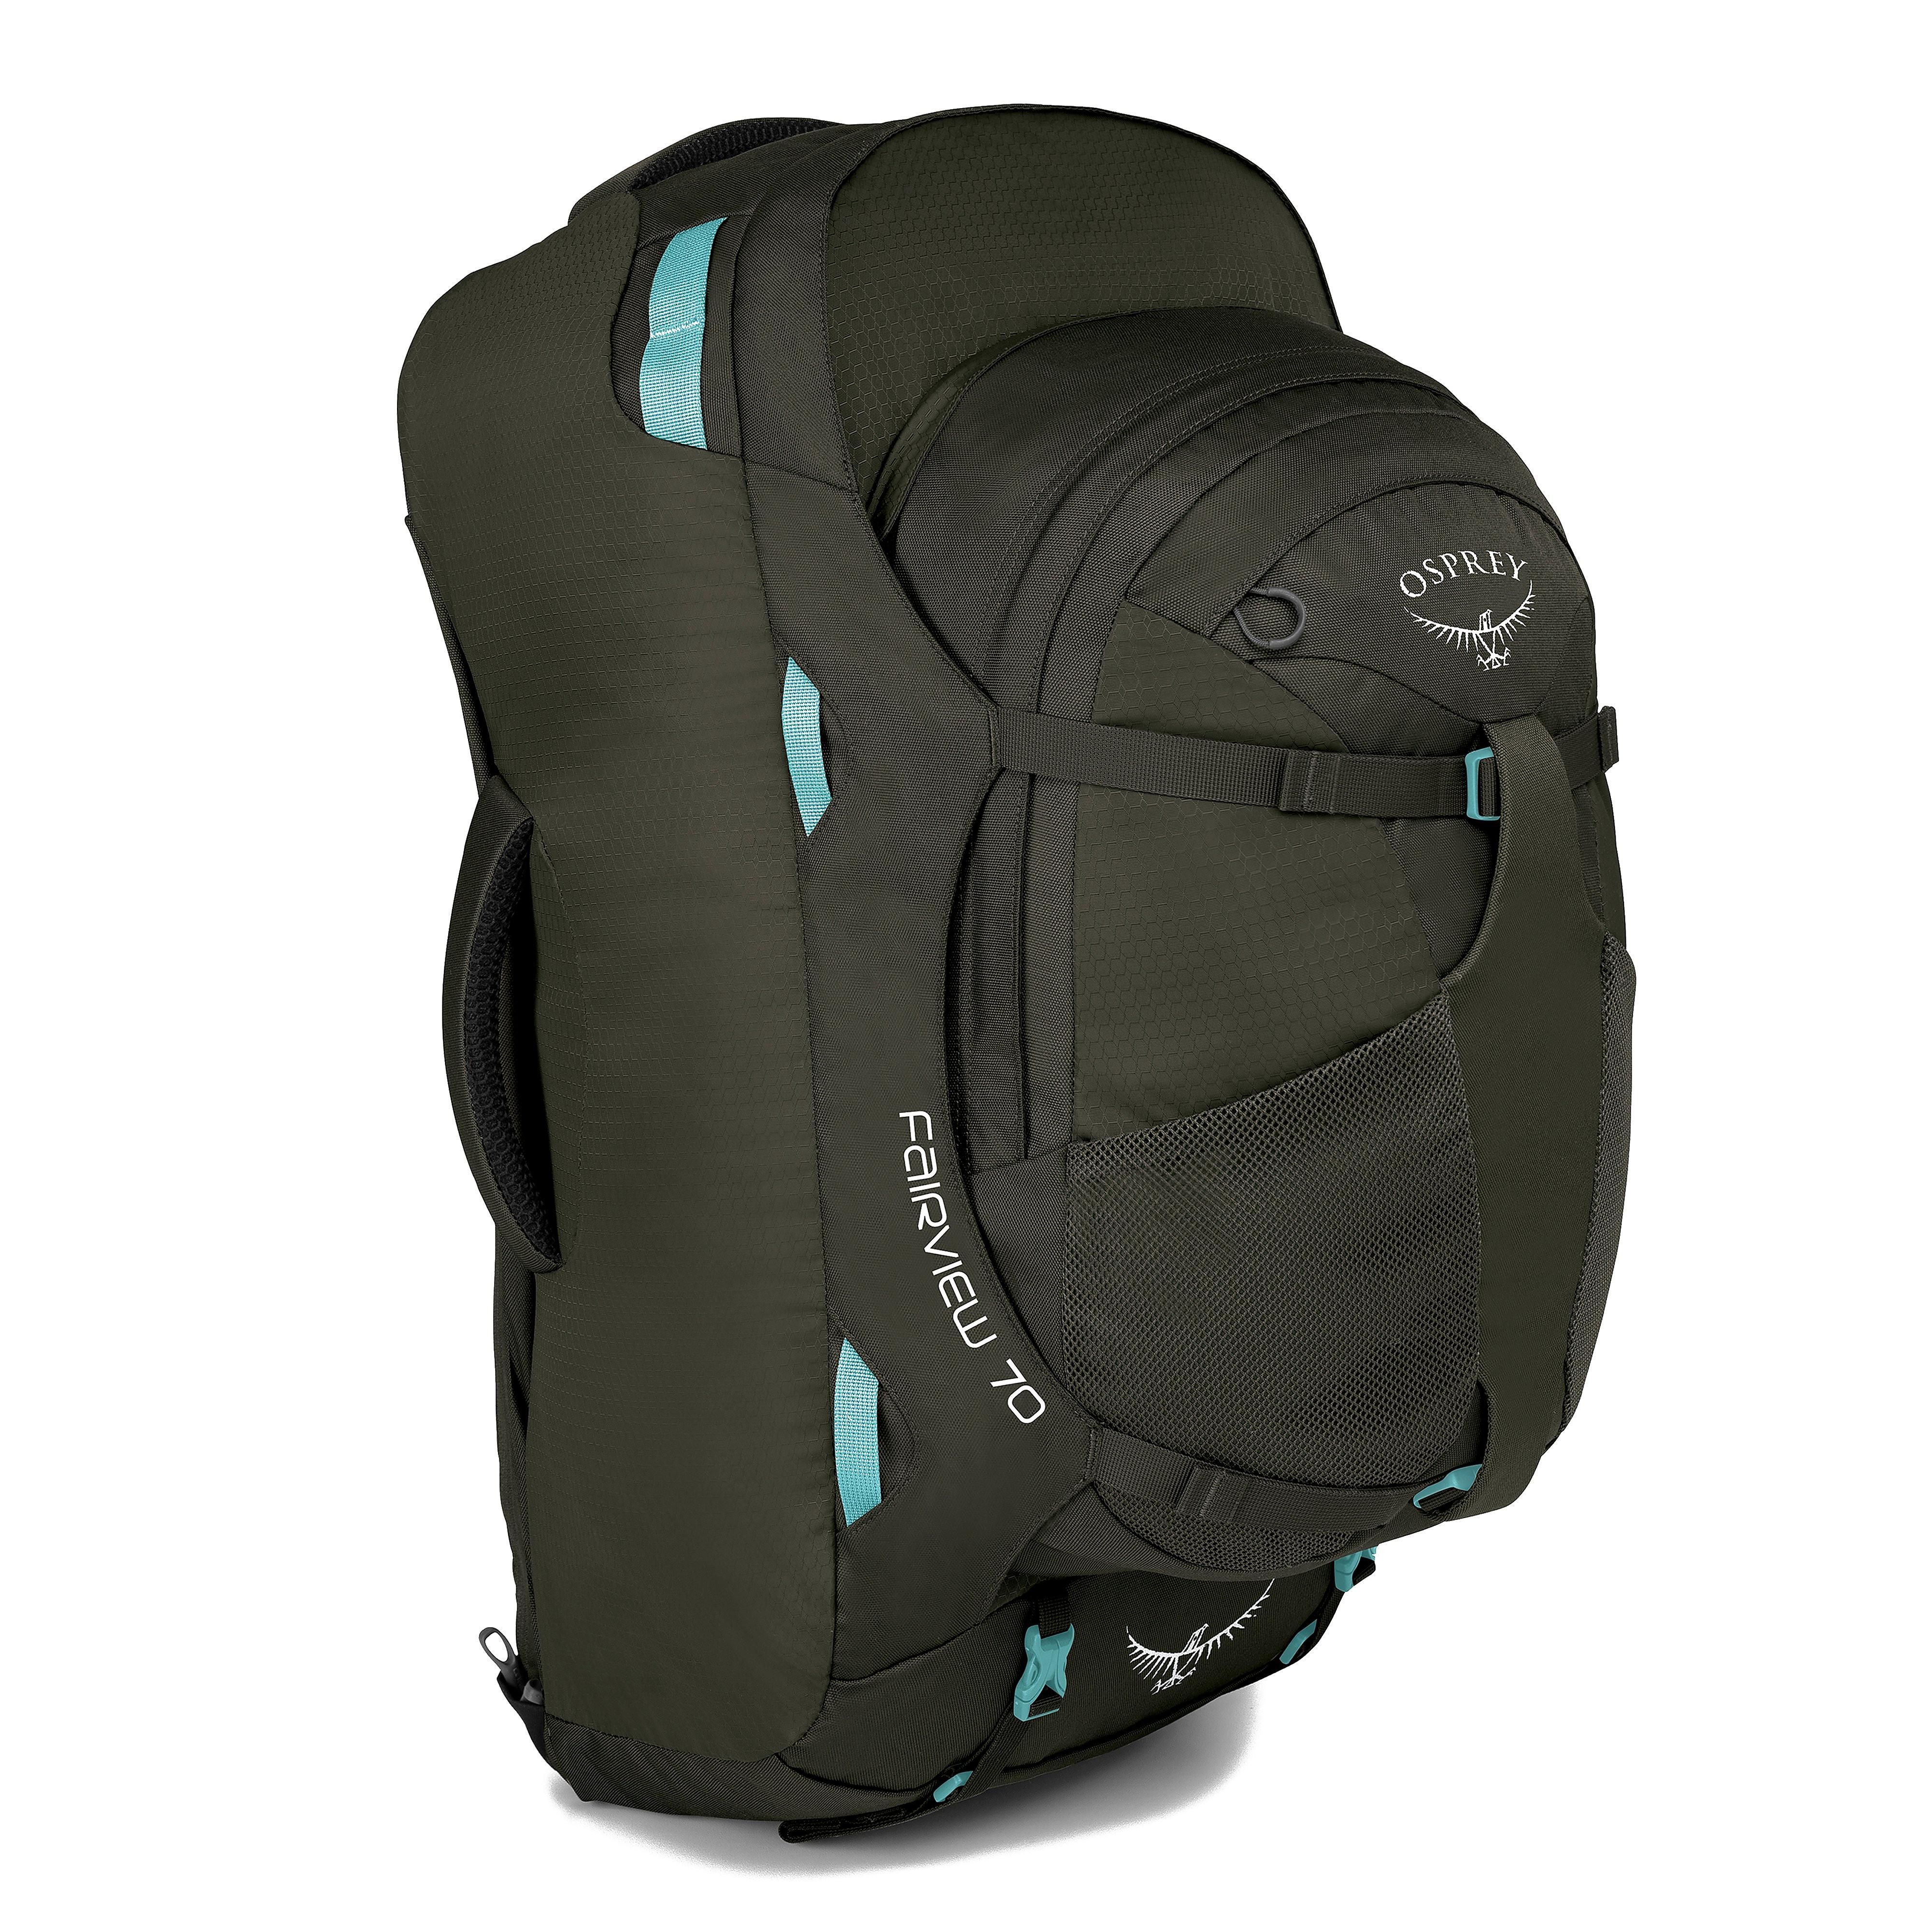 Osprey Fairview 70 Backpack